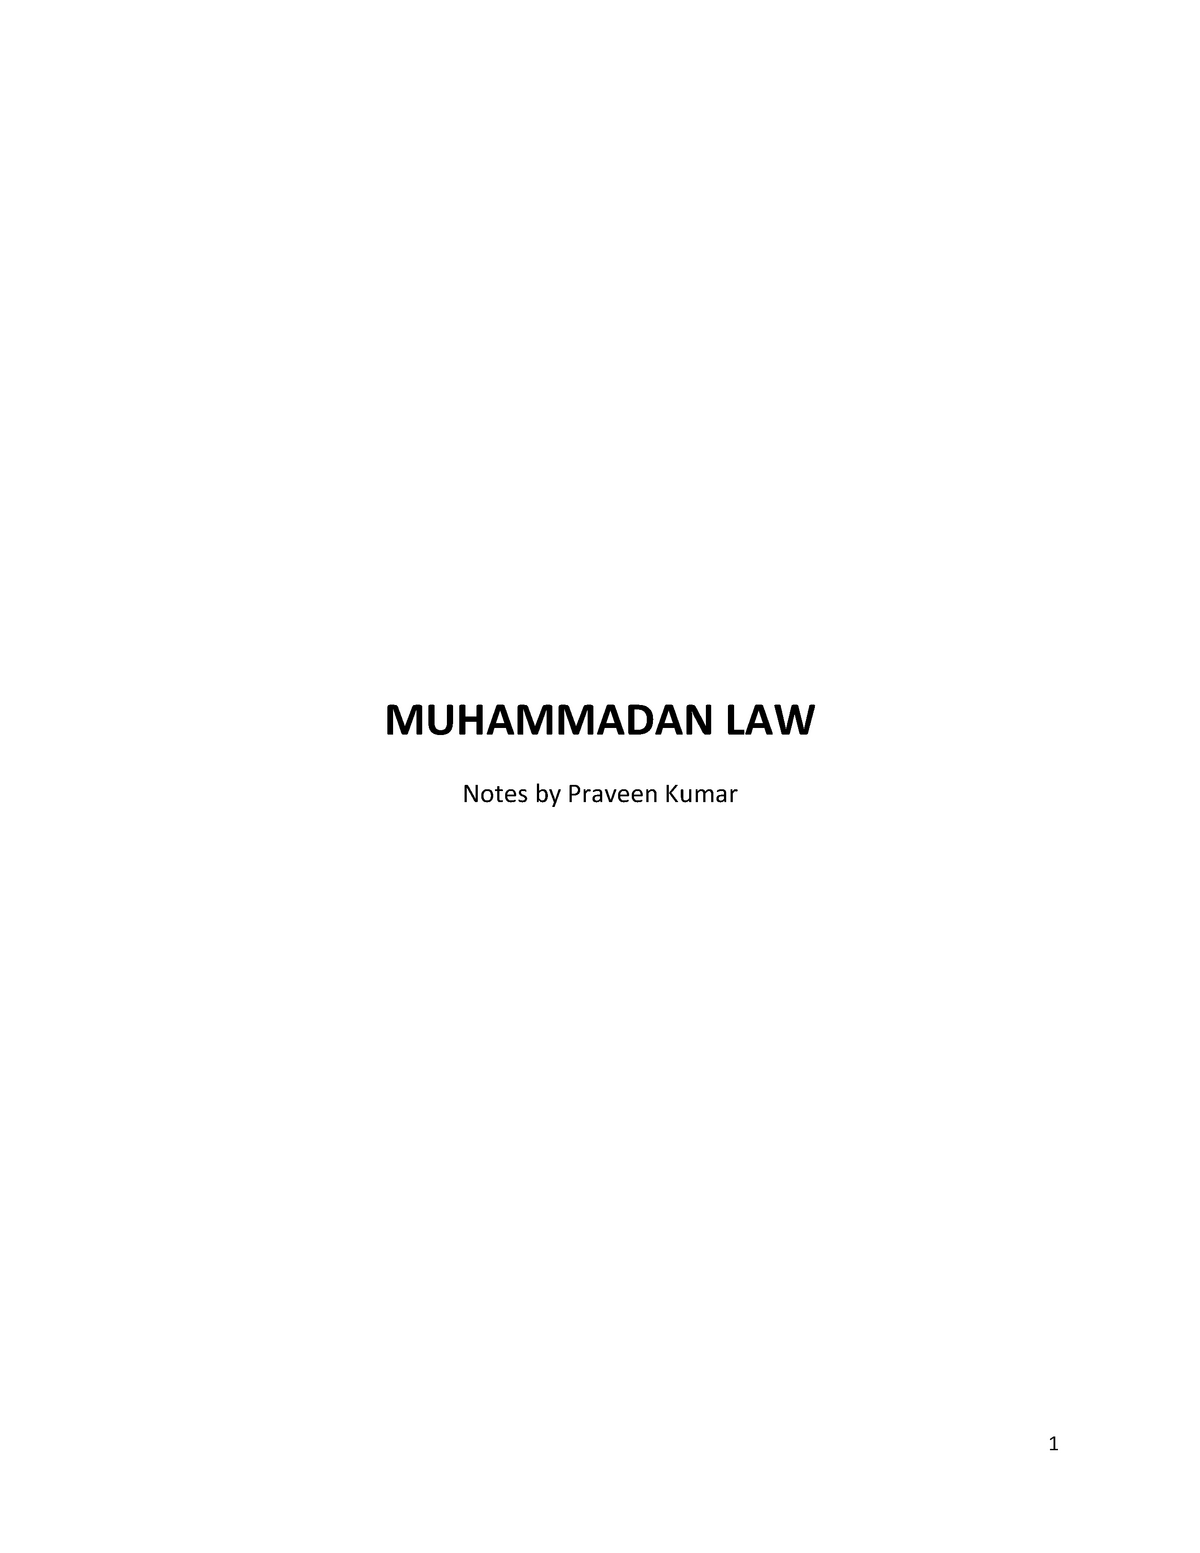 Muhammadan Laws - 0205 - StuDocu